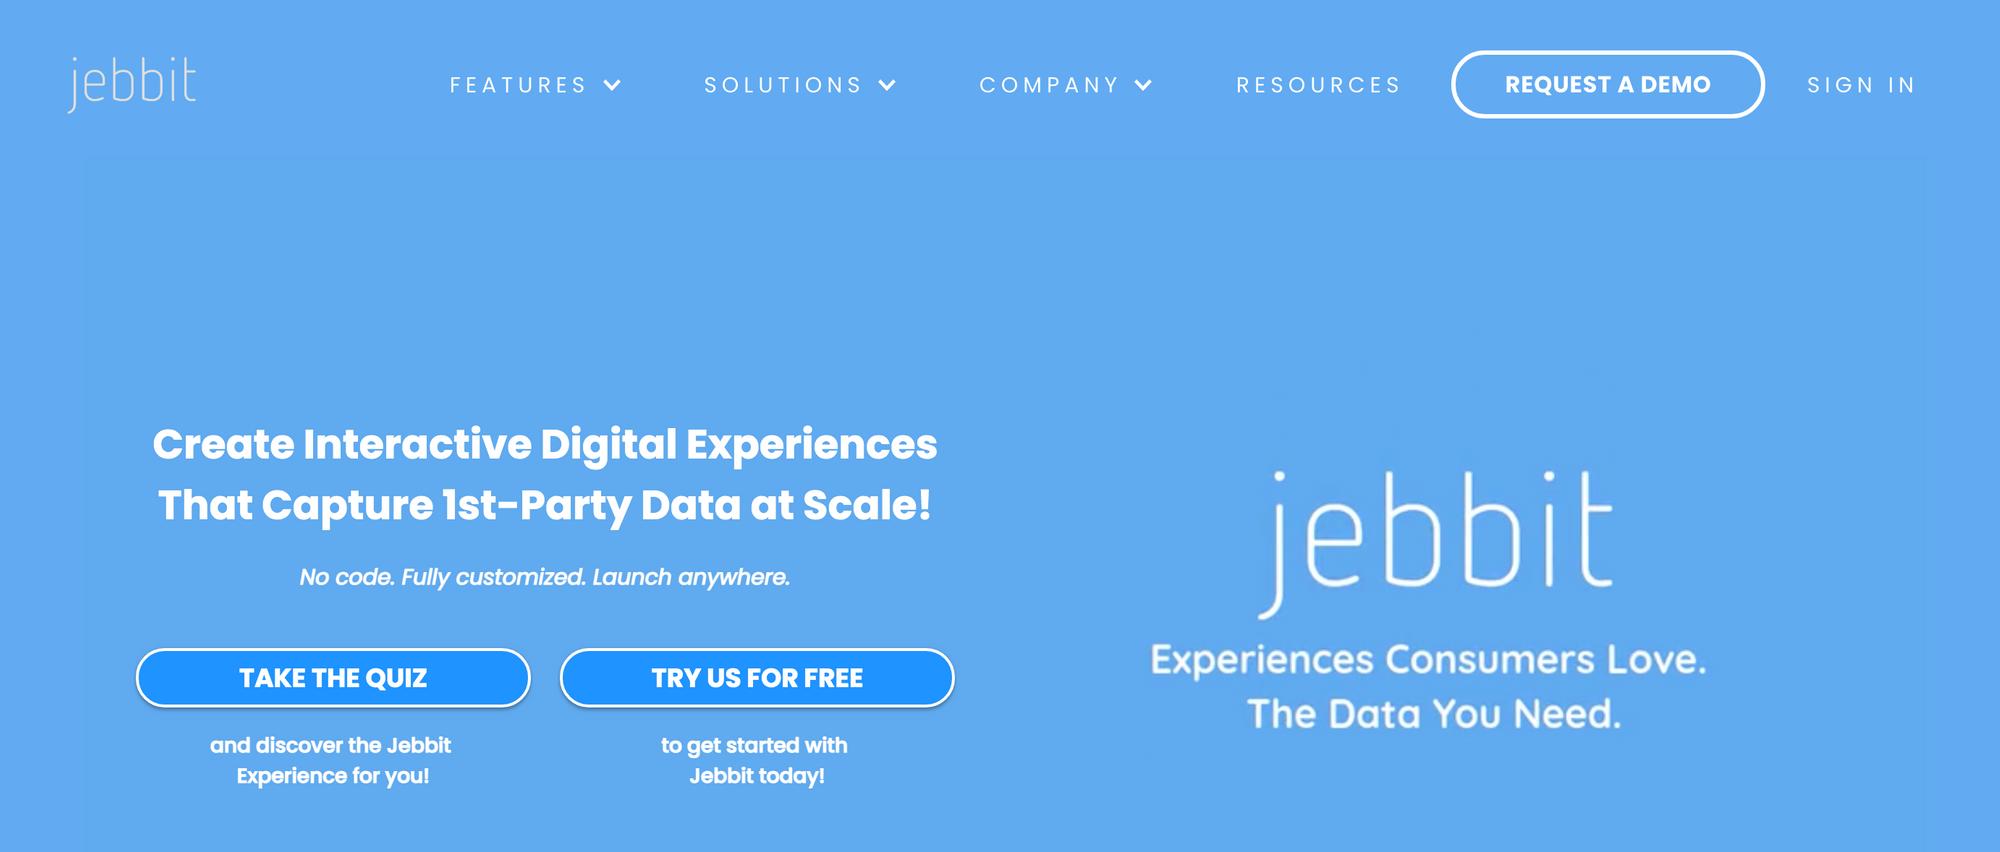 Top Shopify App Jebbit